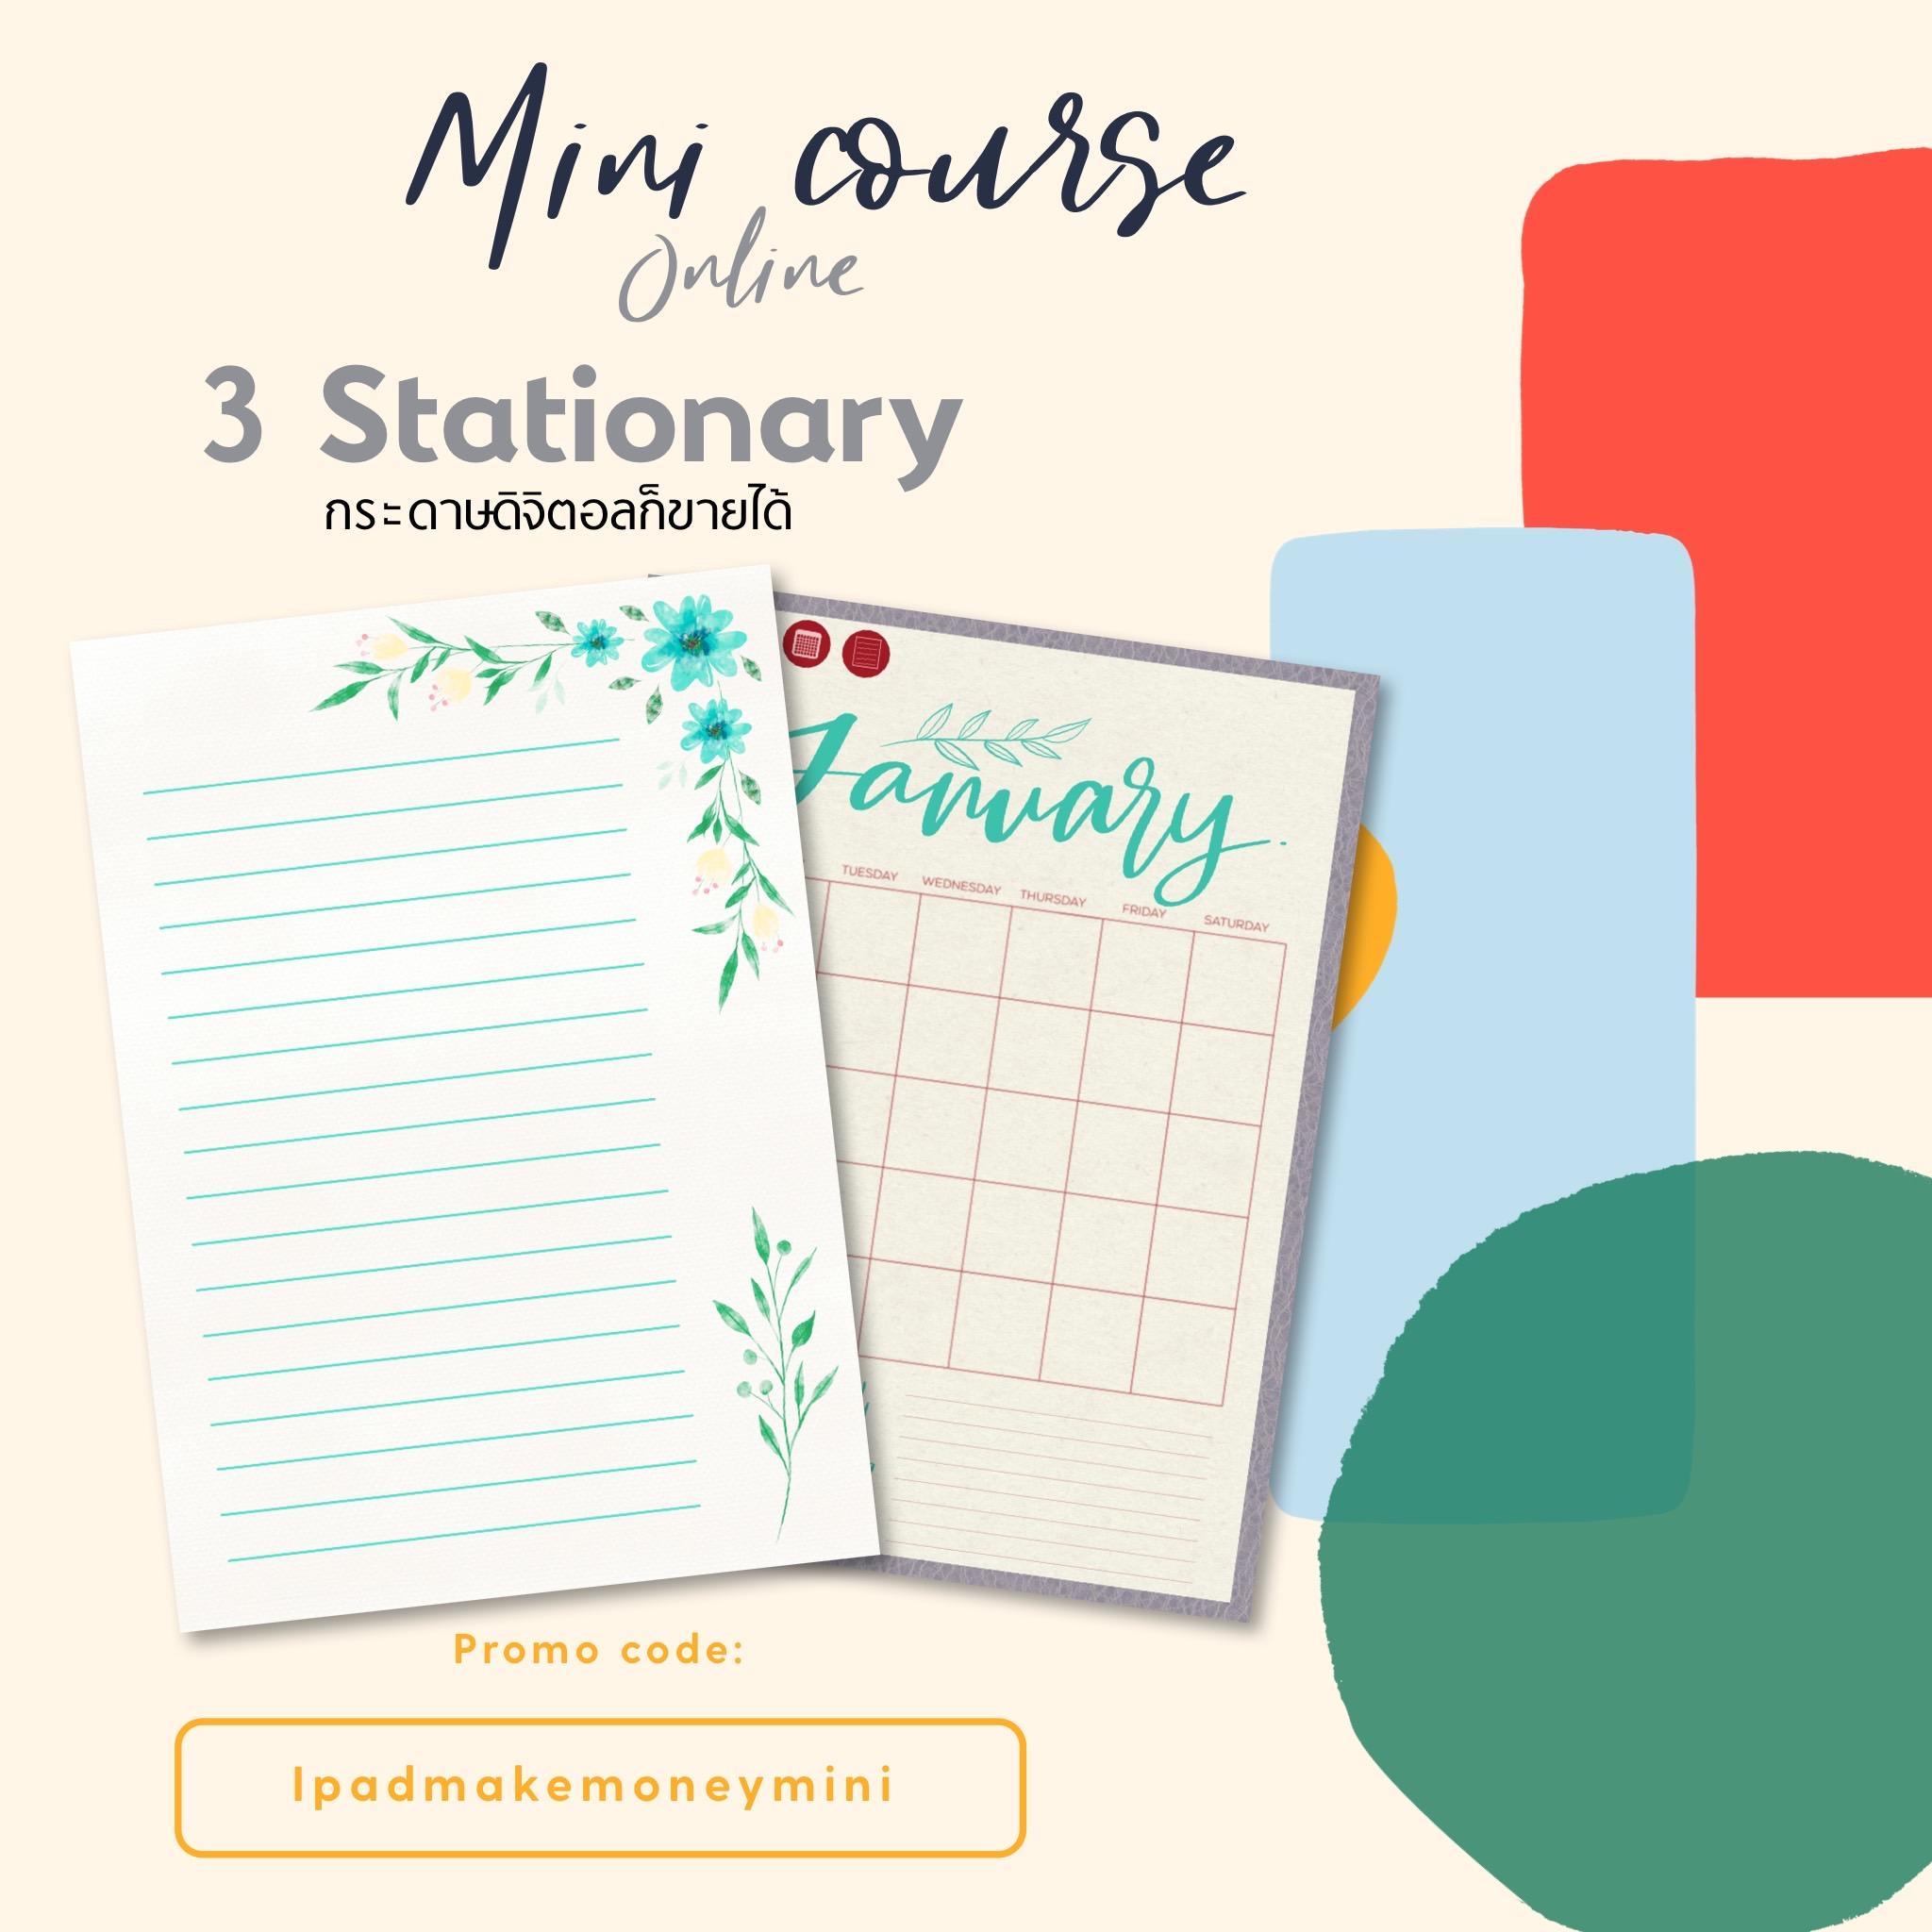 Mini Course Stationary